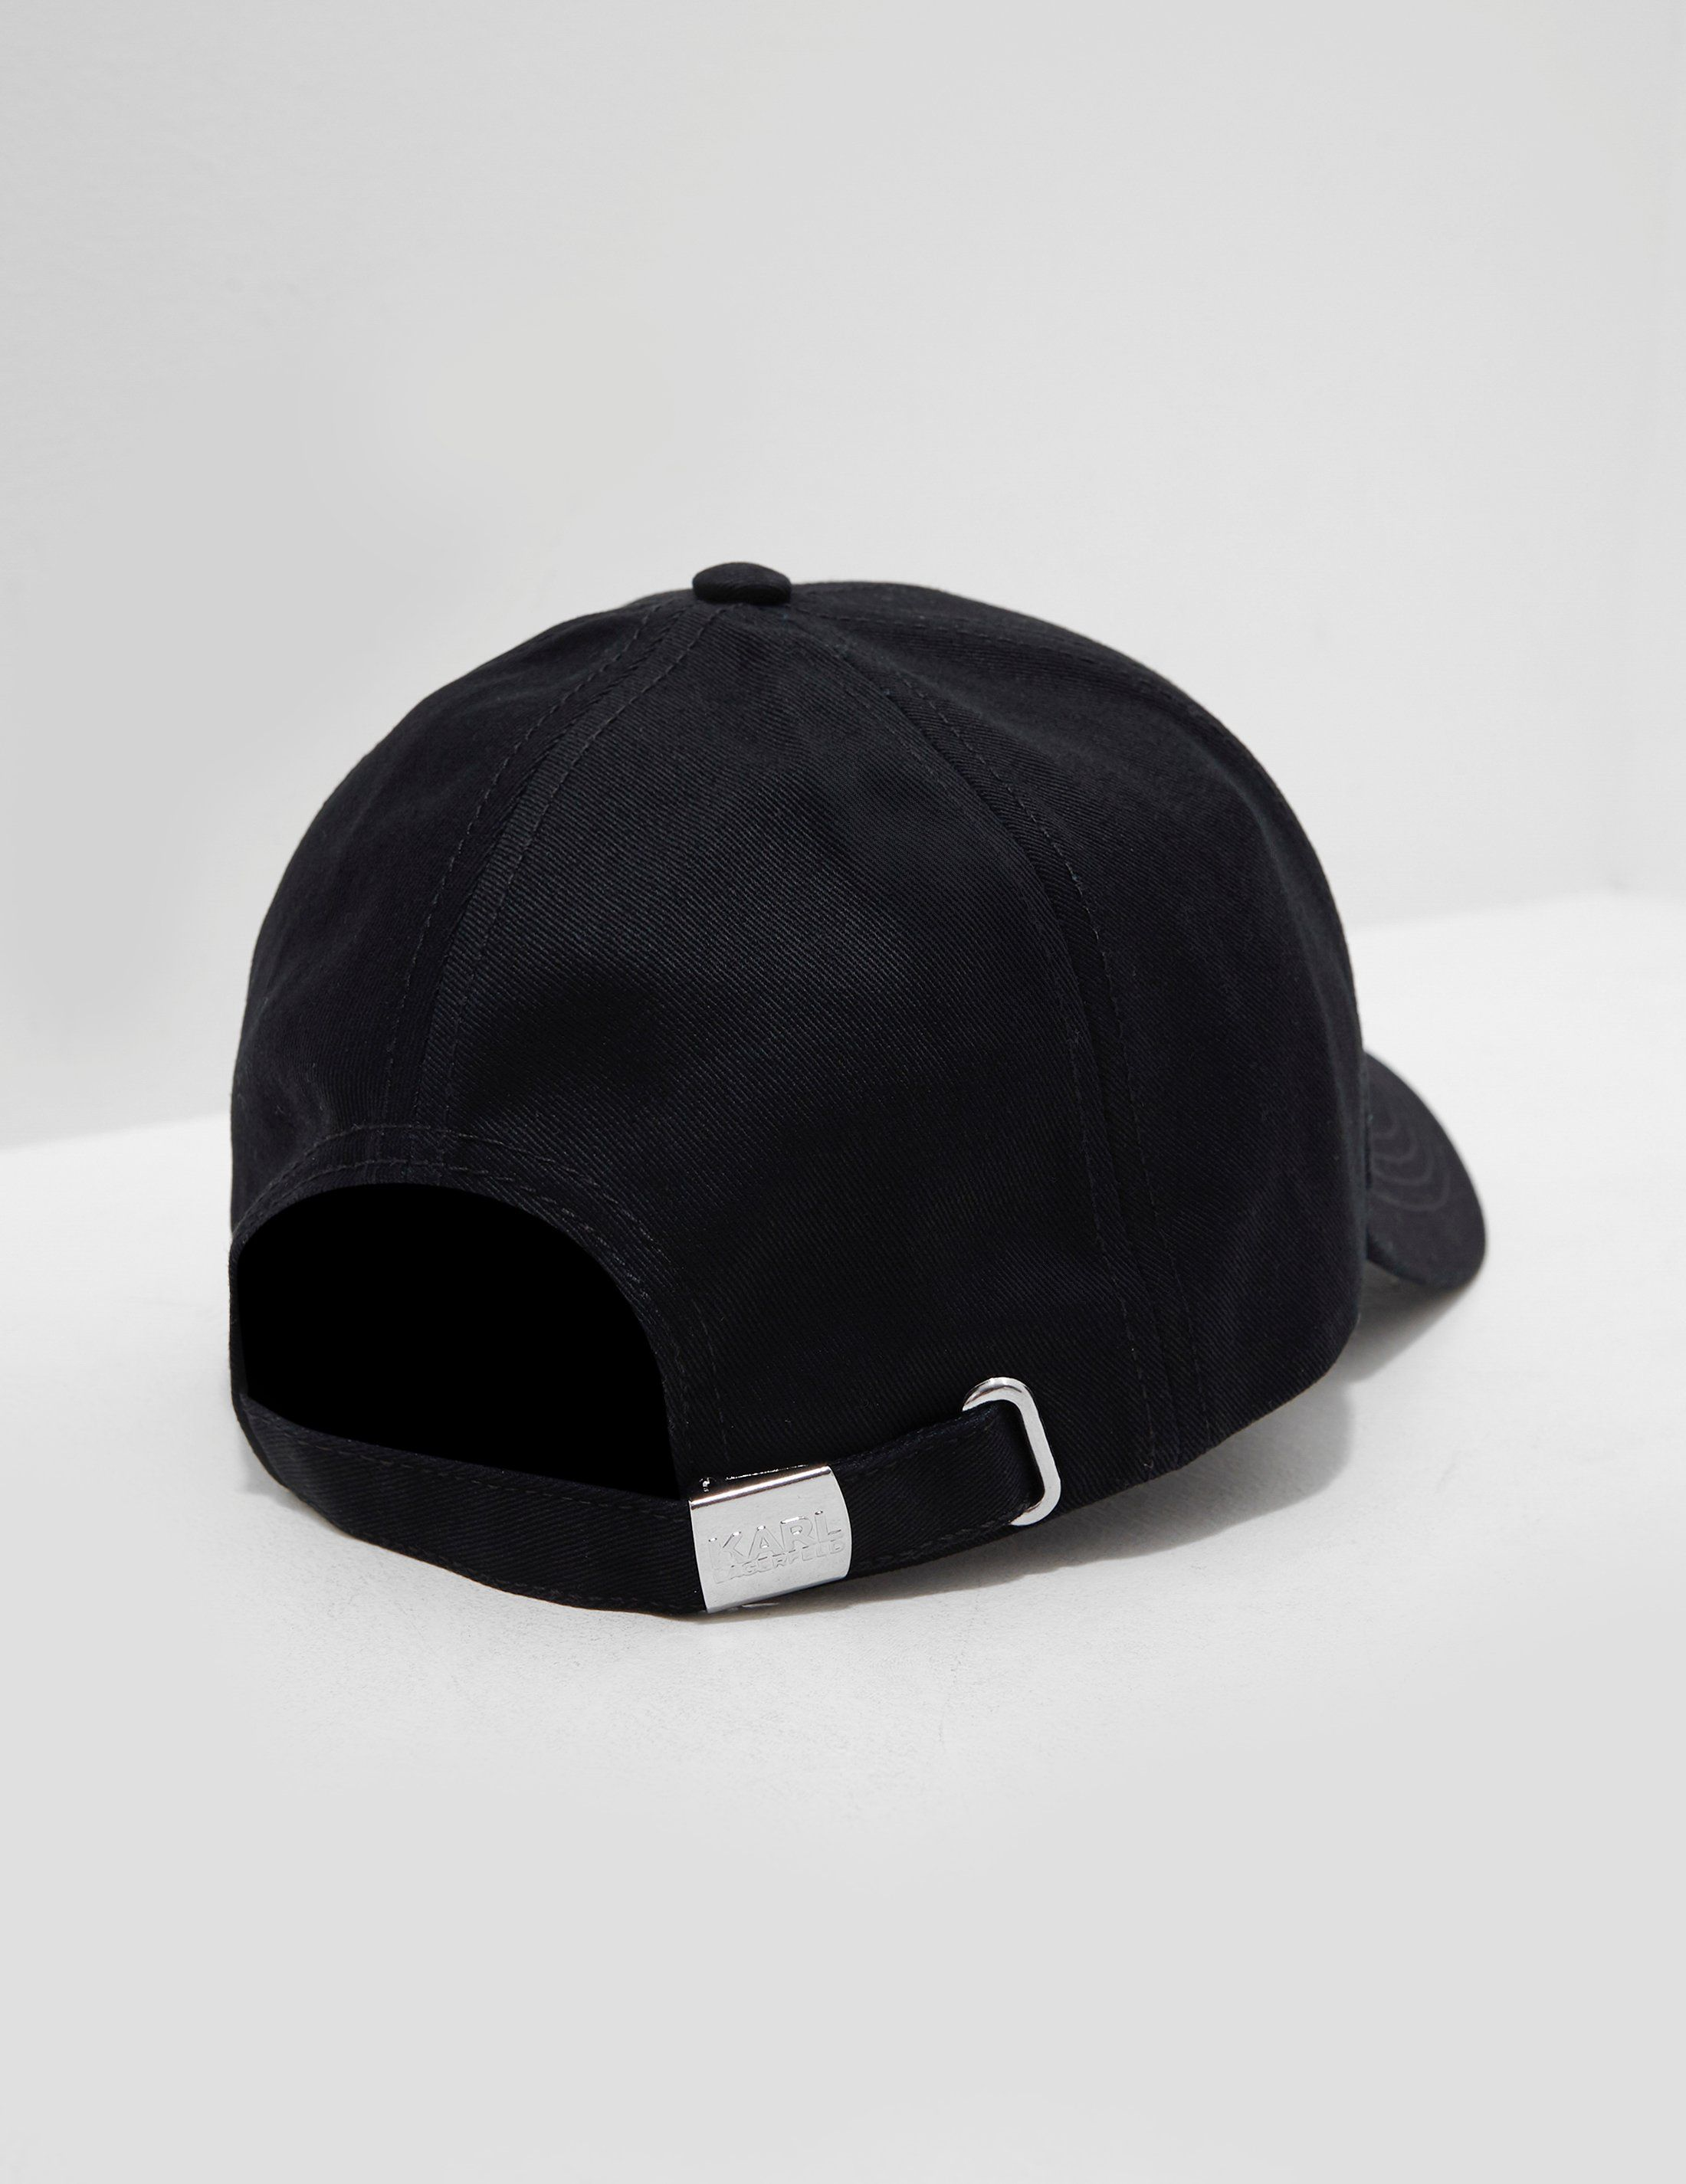 Karl Lagerfeld Signature Cap